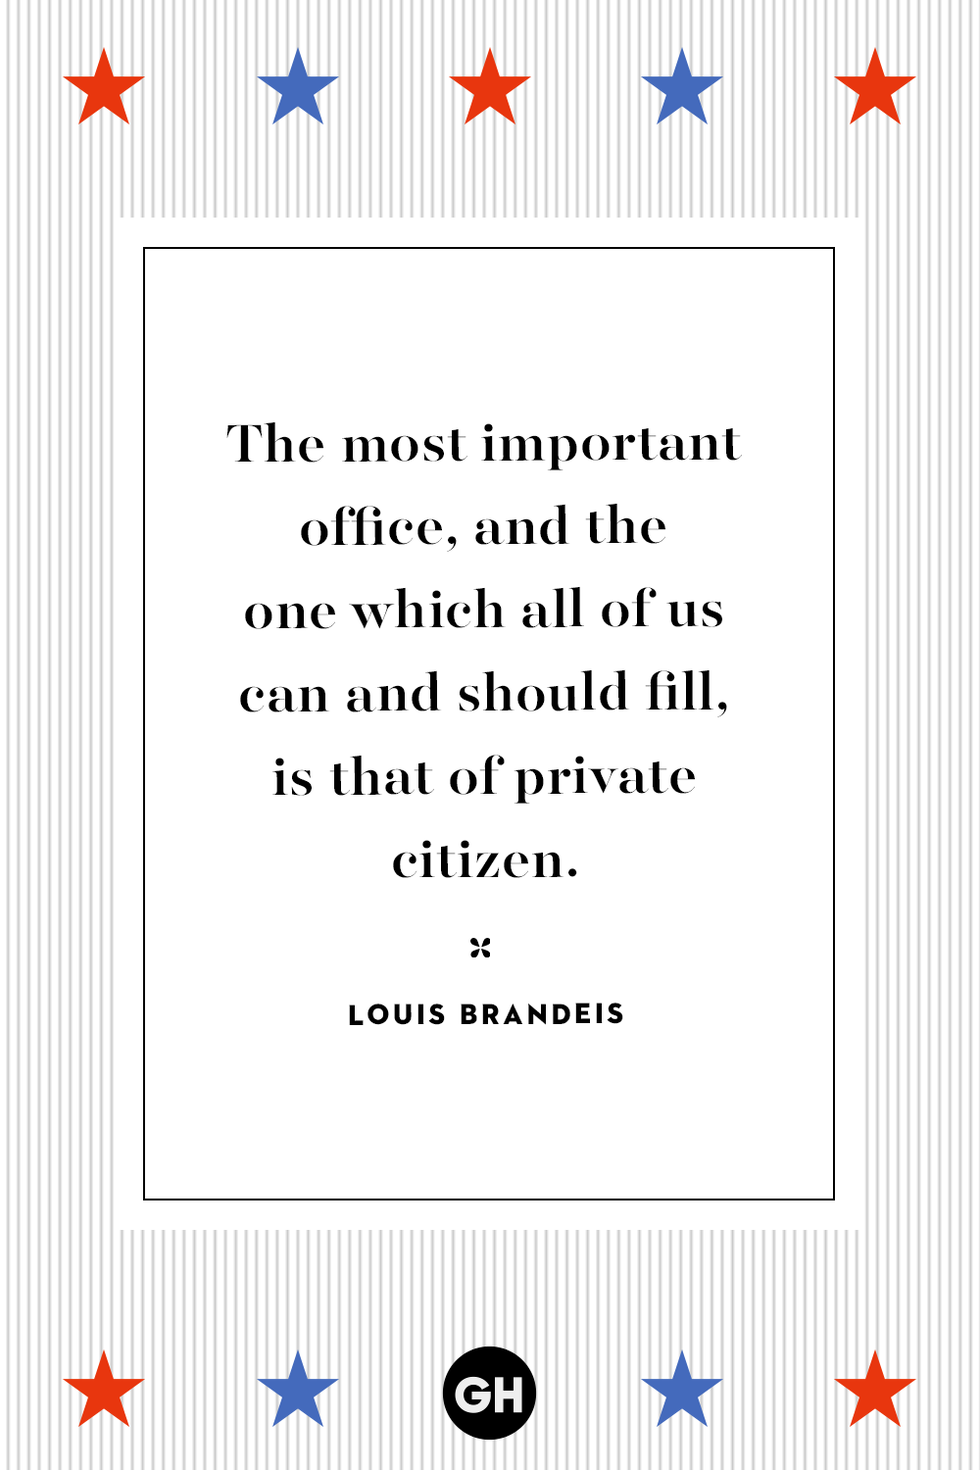 election-quotes-voting-quotes-02-louis-brandeis-1567019362